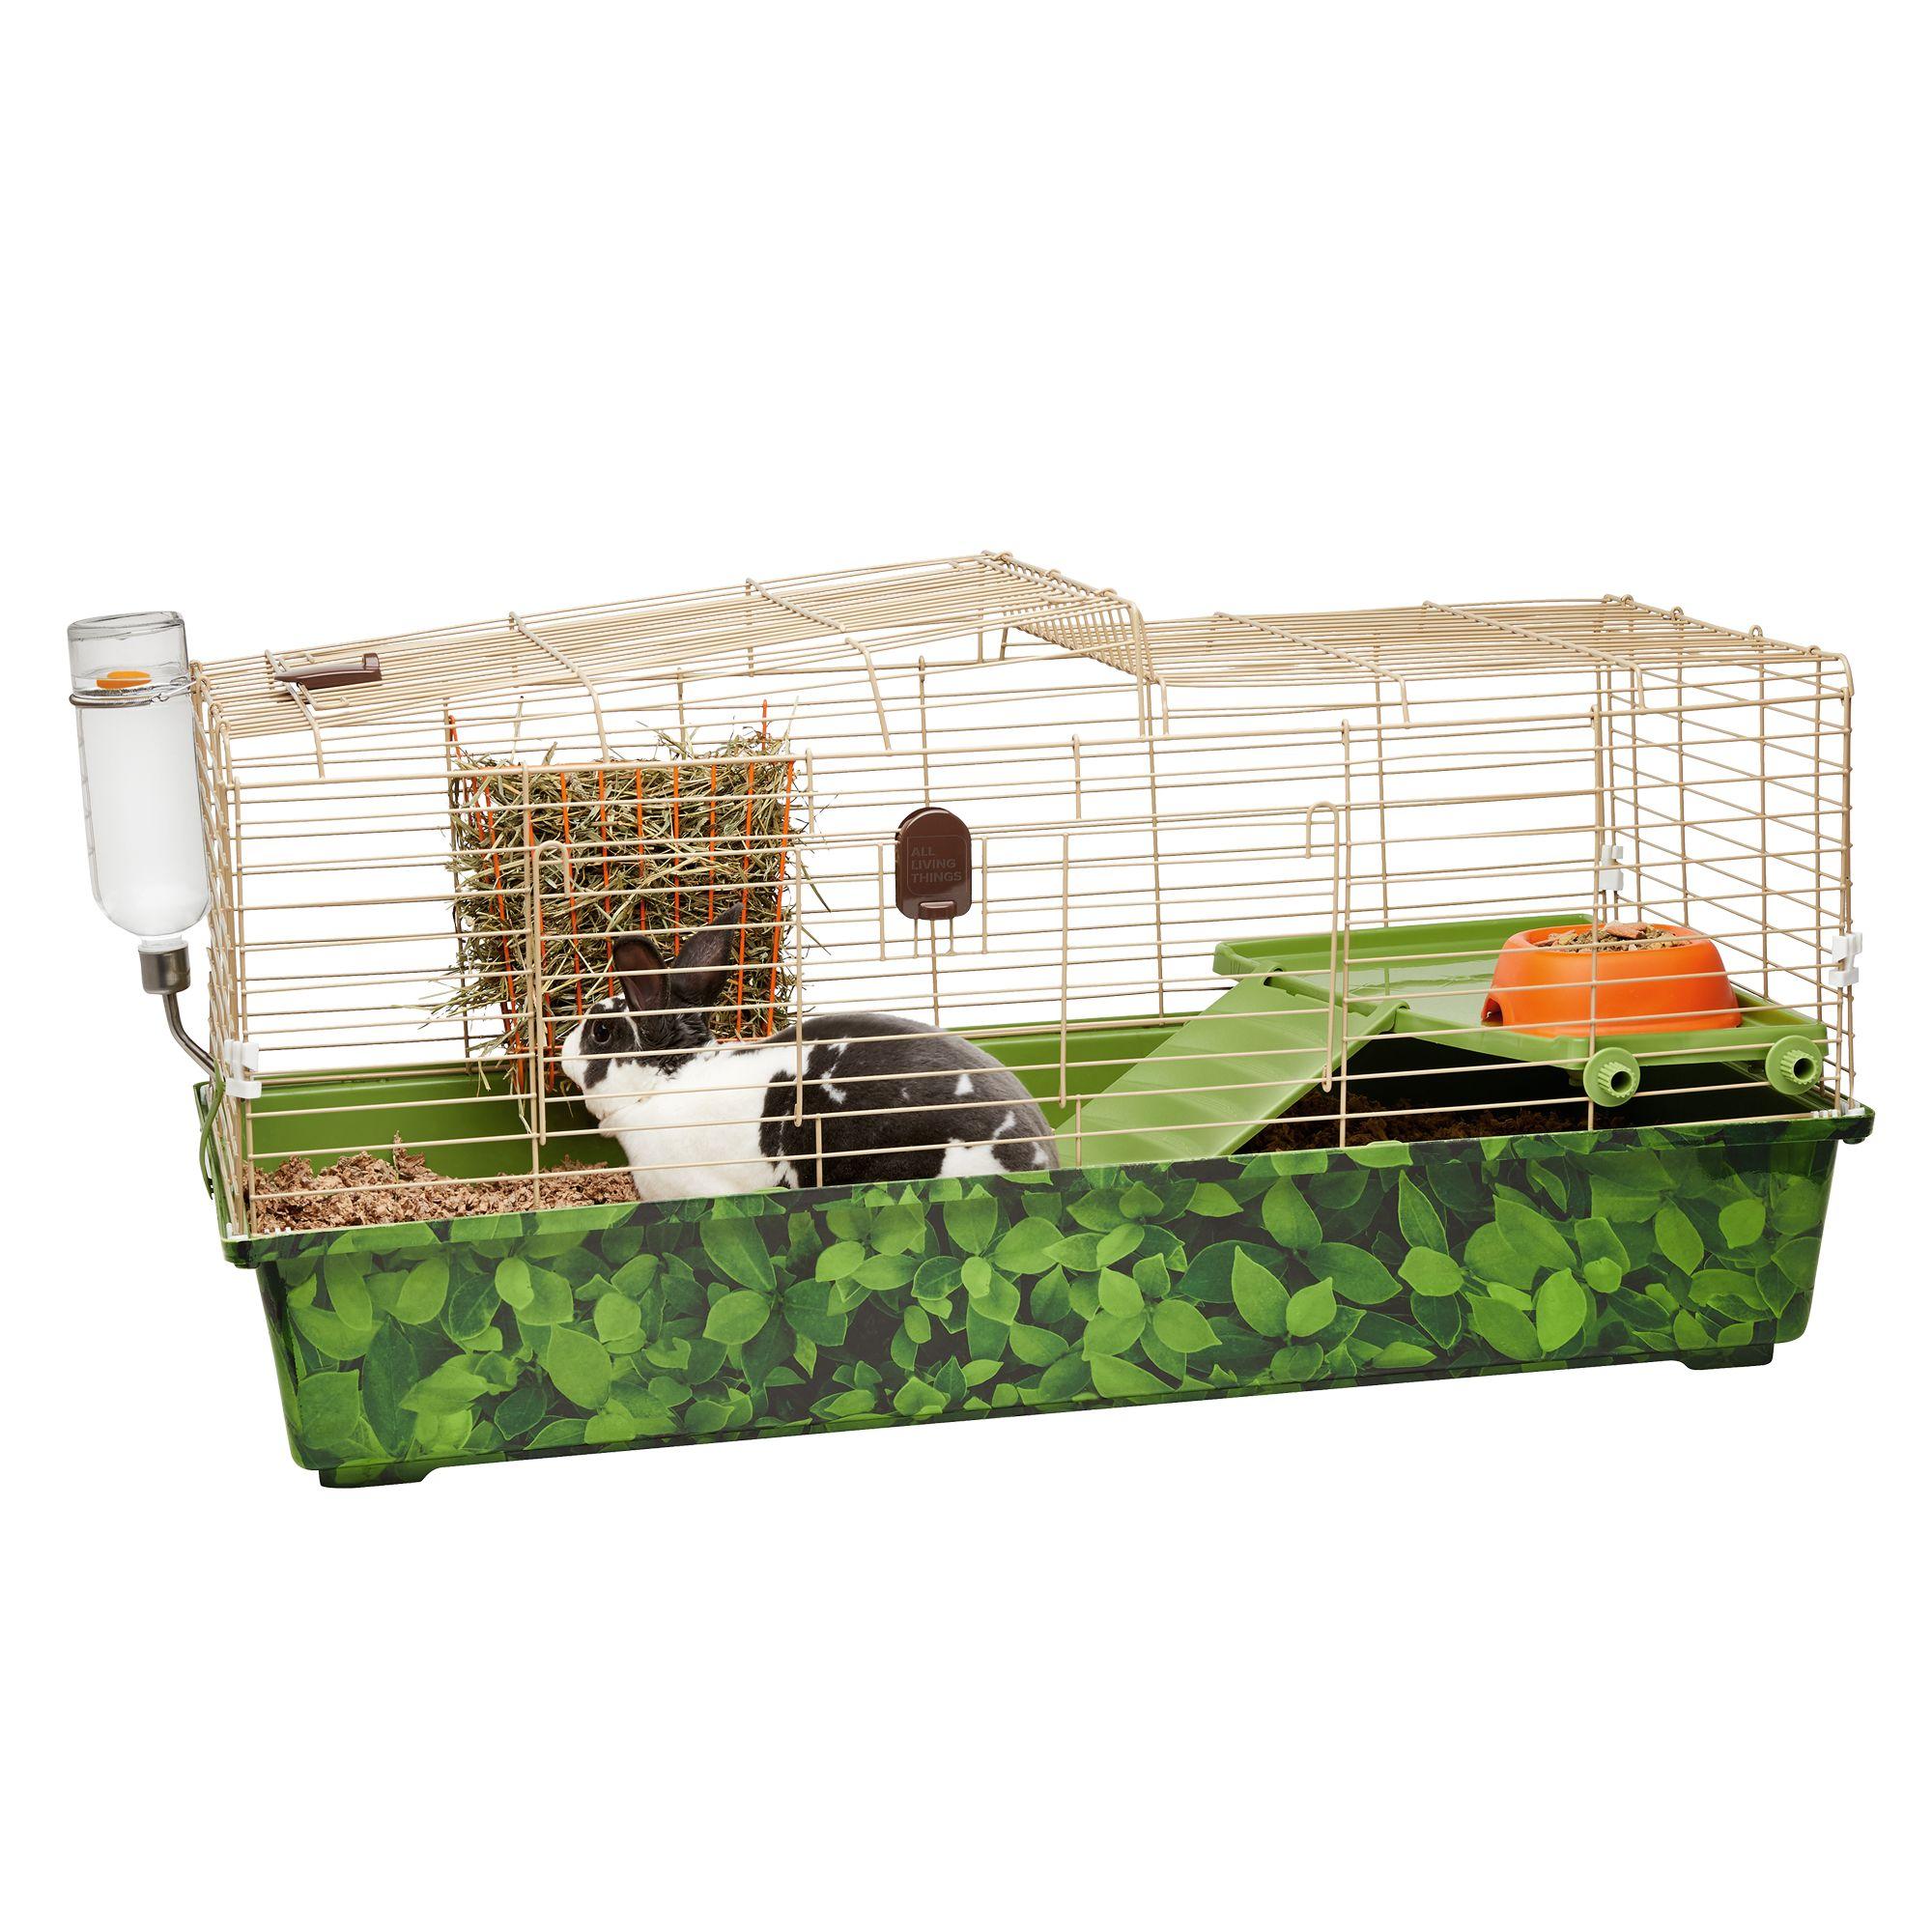 All Living Things Rabbit Comfy Getaway Trade Small Pet Habitat Small Pet Cages Petsmart